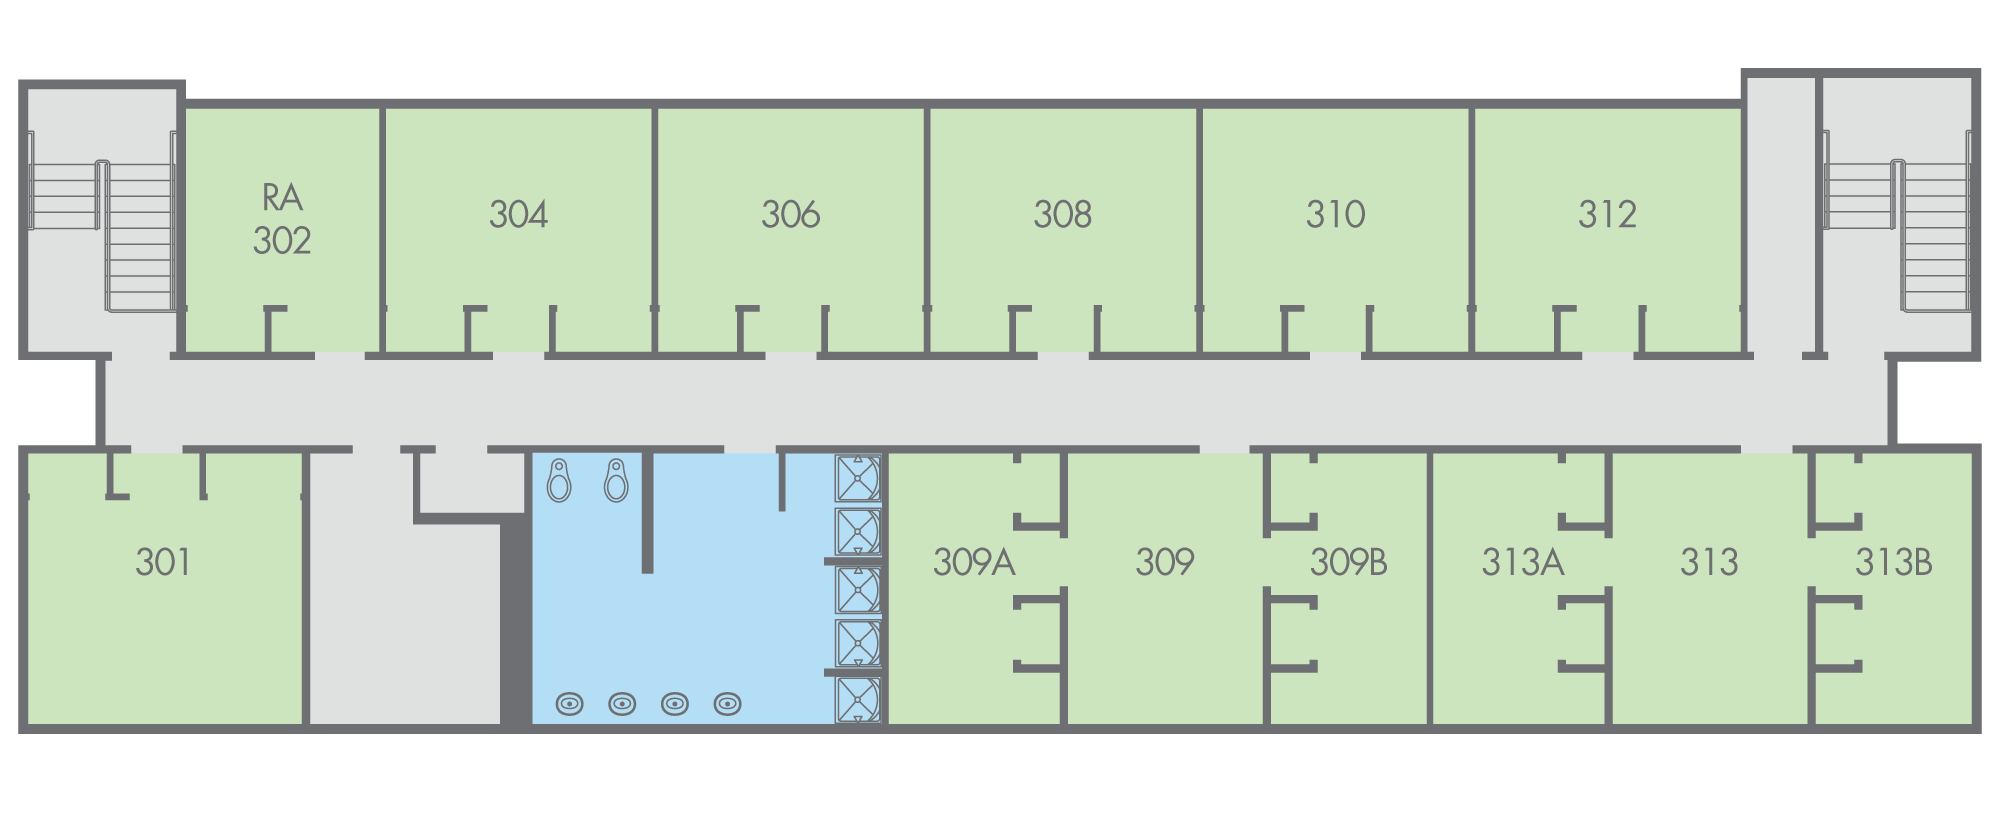 Nova Building Floor Plans